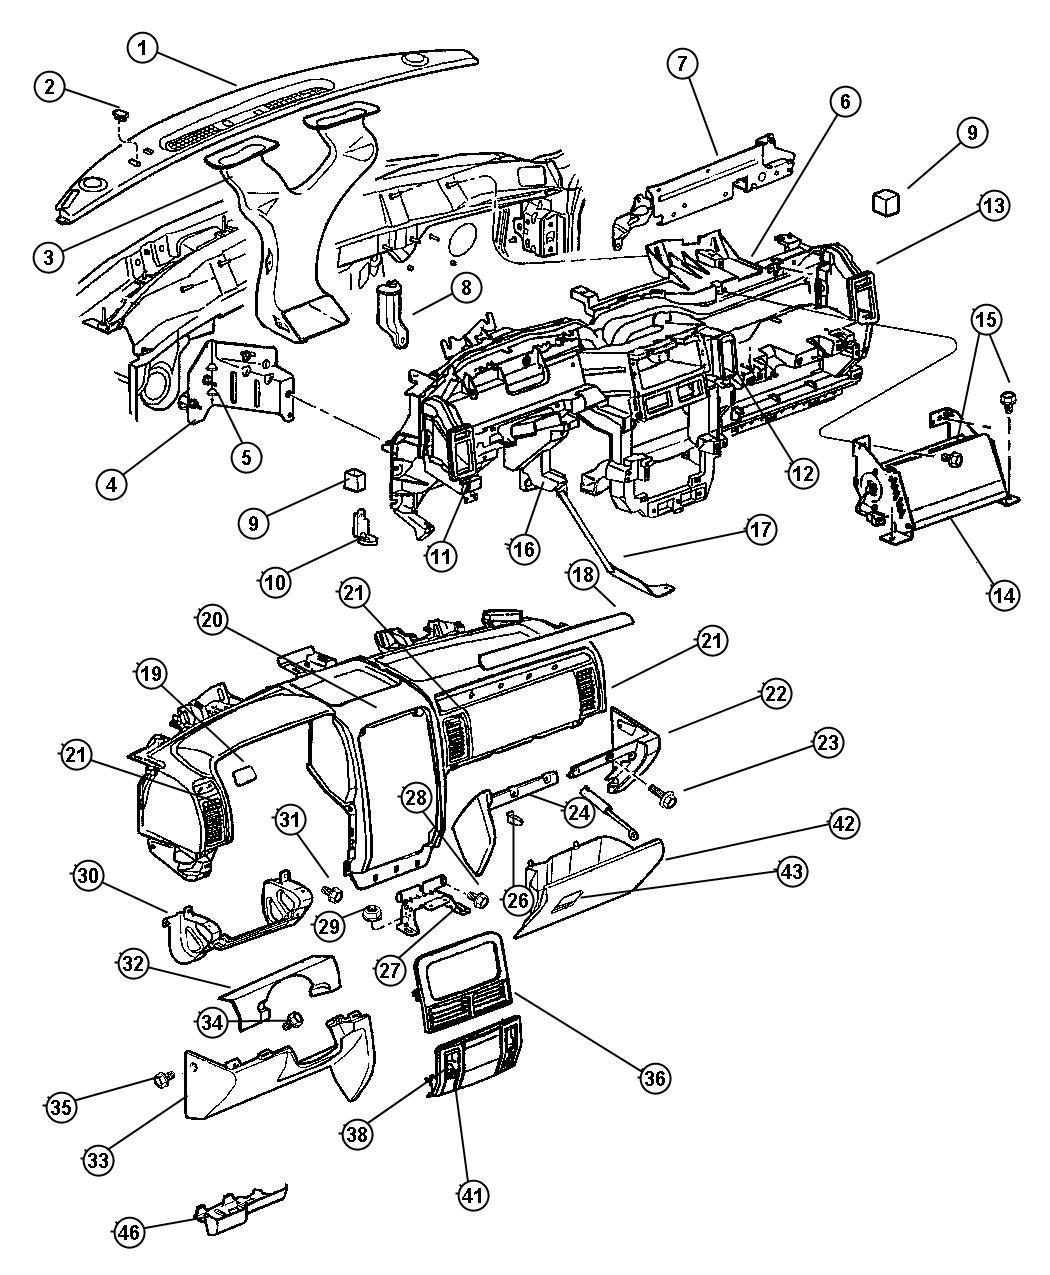 Jeep Grand Cherokee Cap. Instrument panel end. [l5]. Trim